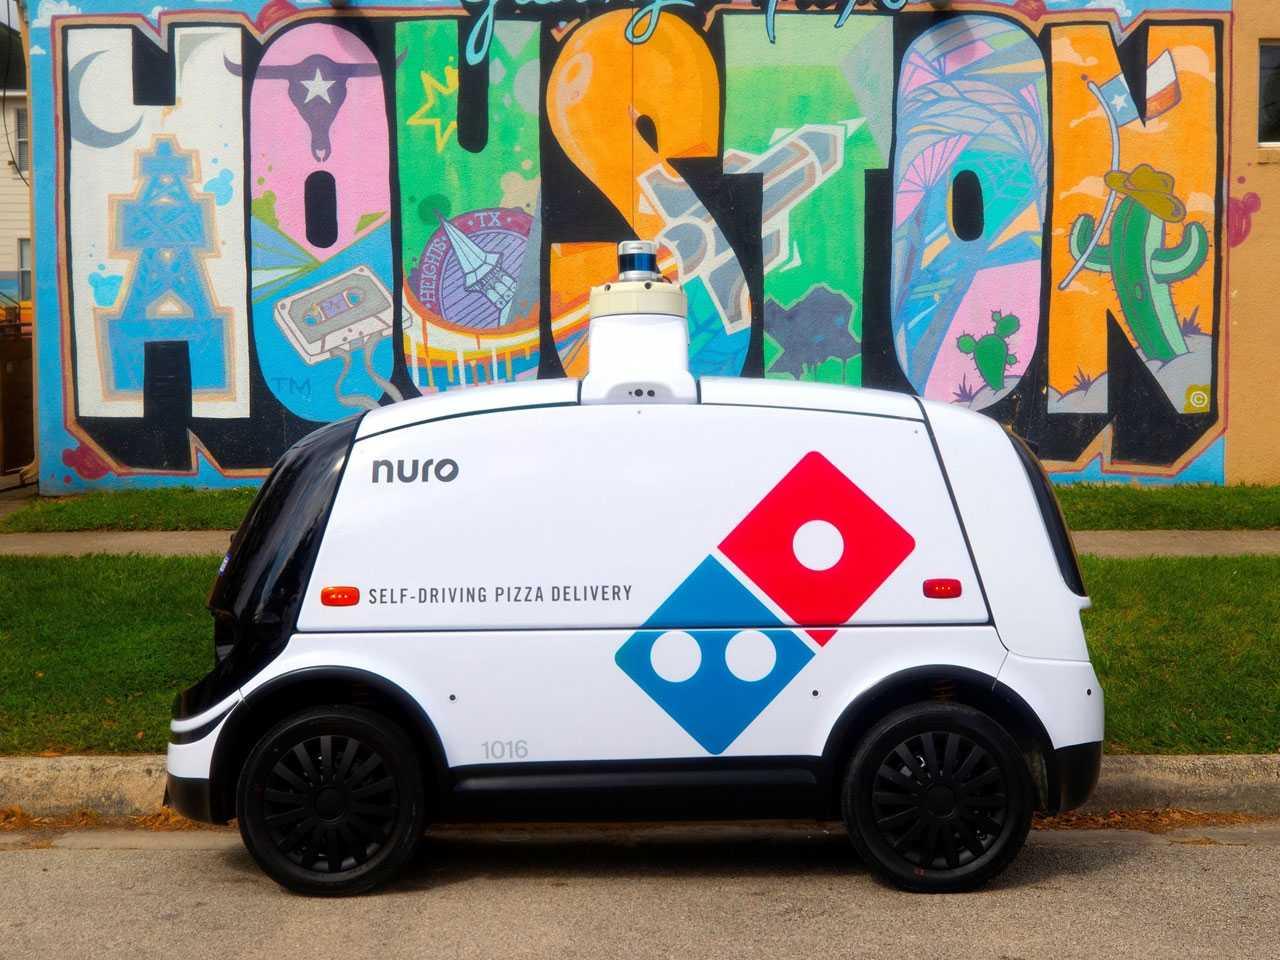 O Nuro R2, veículo autônomo que faz entregas para a Dominos Pizza nos EUA